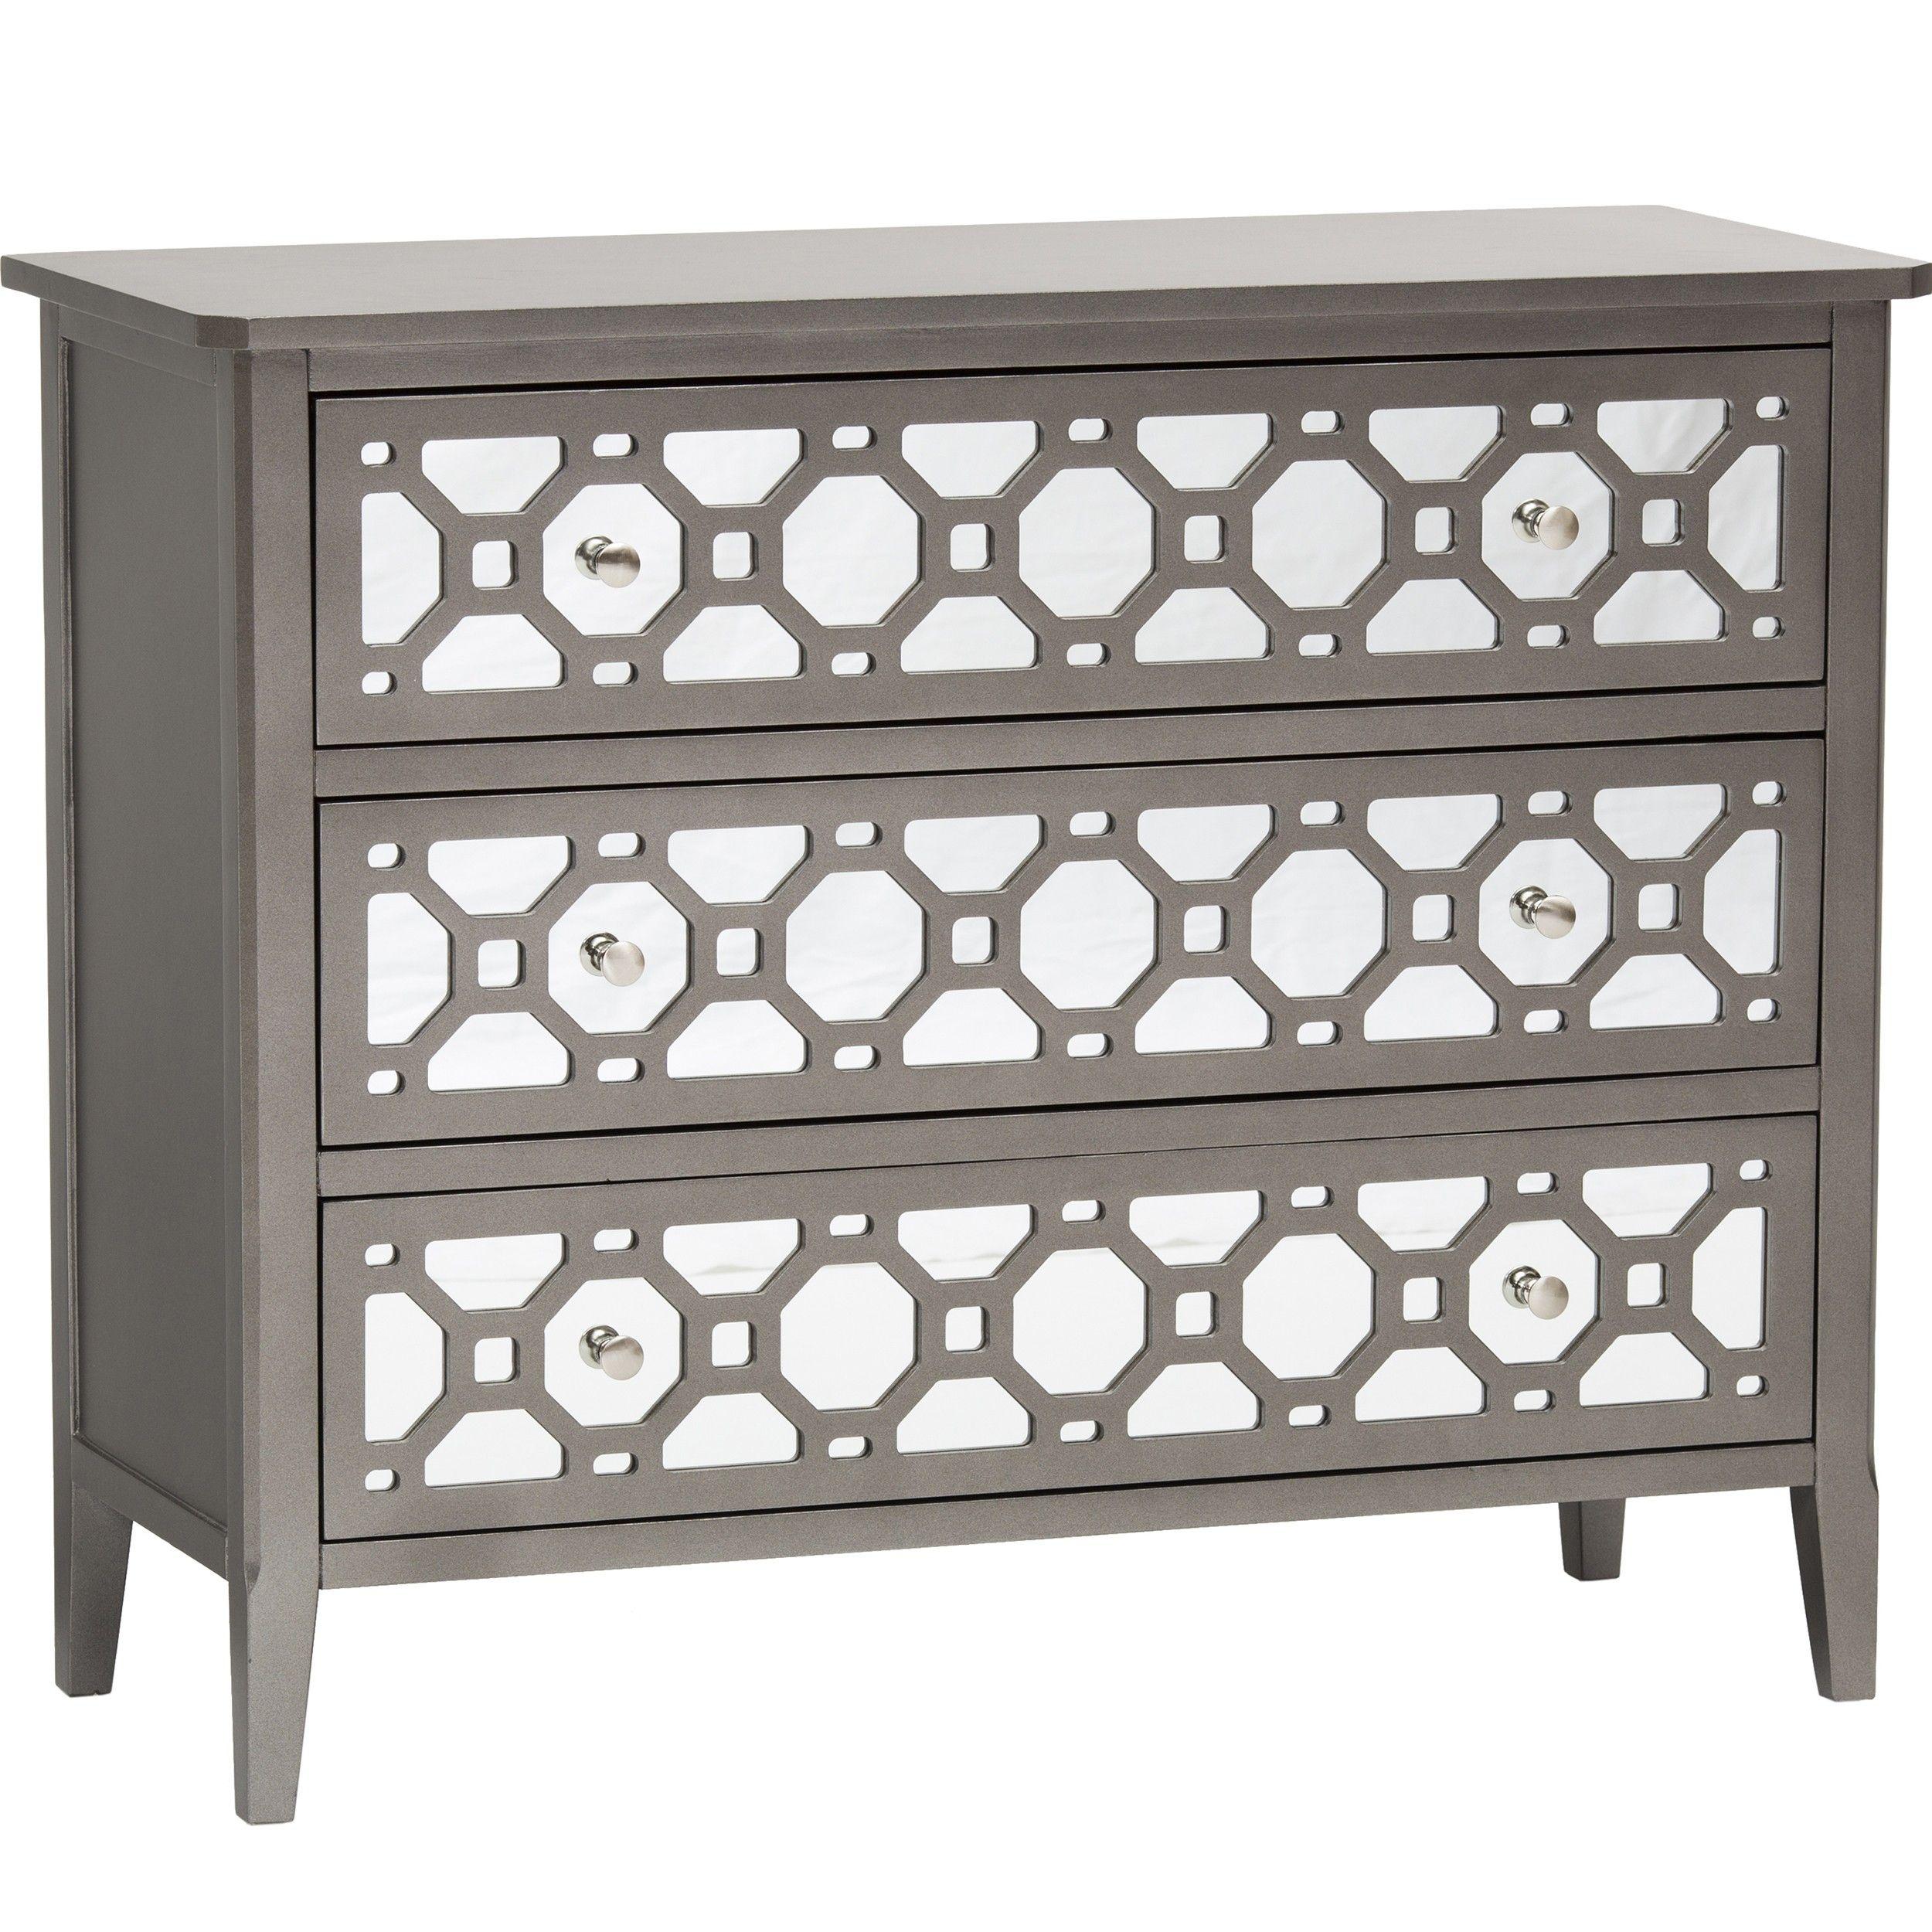 Kaylan 3 Drawer Mirrored Chest   Furniture   Bedroom   Nightstands   Mirrored  Furniture